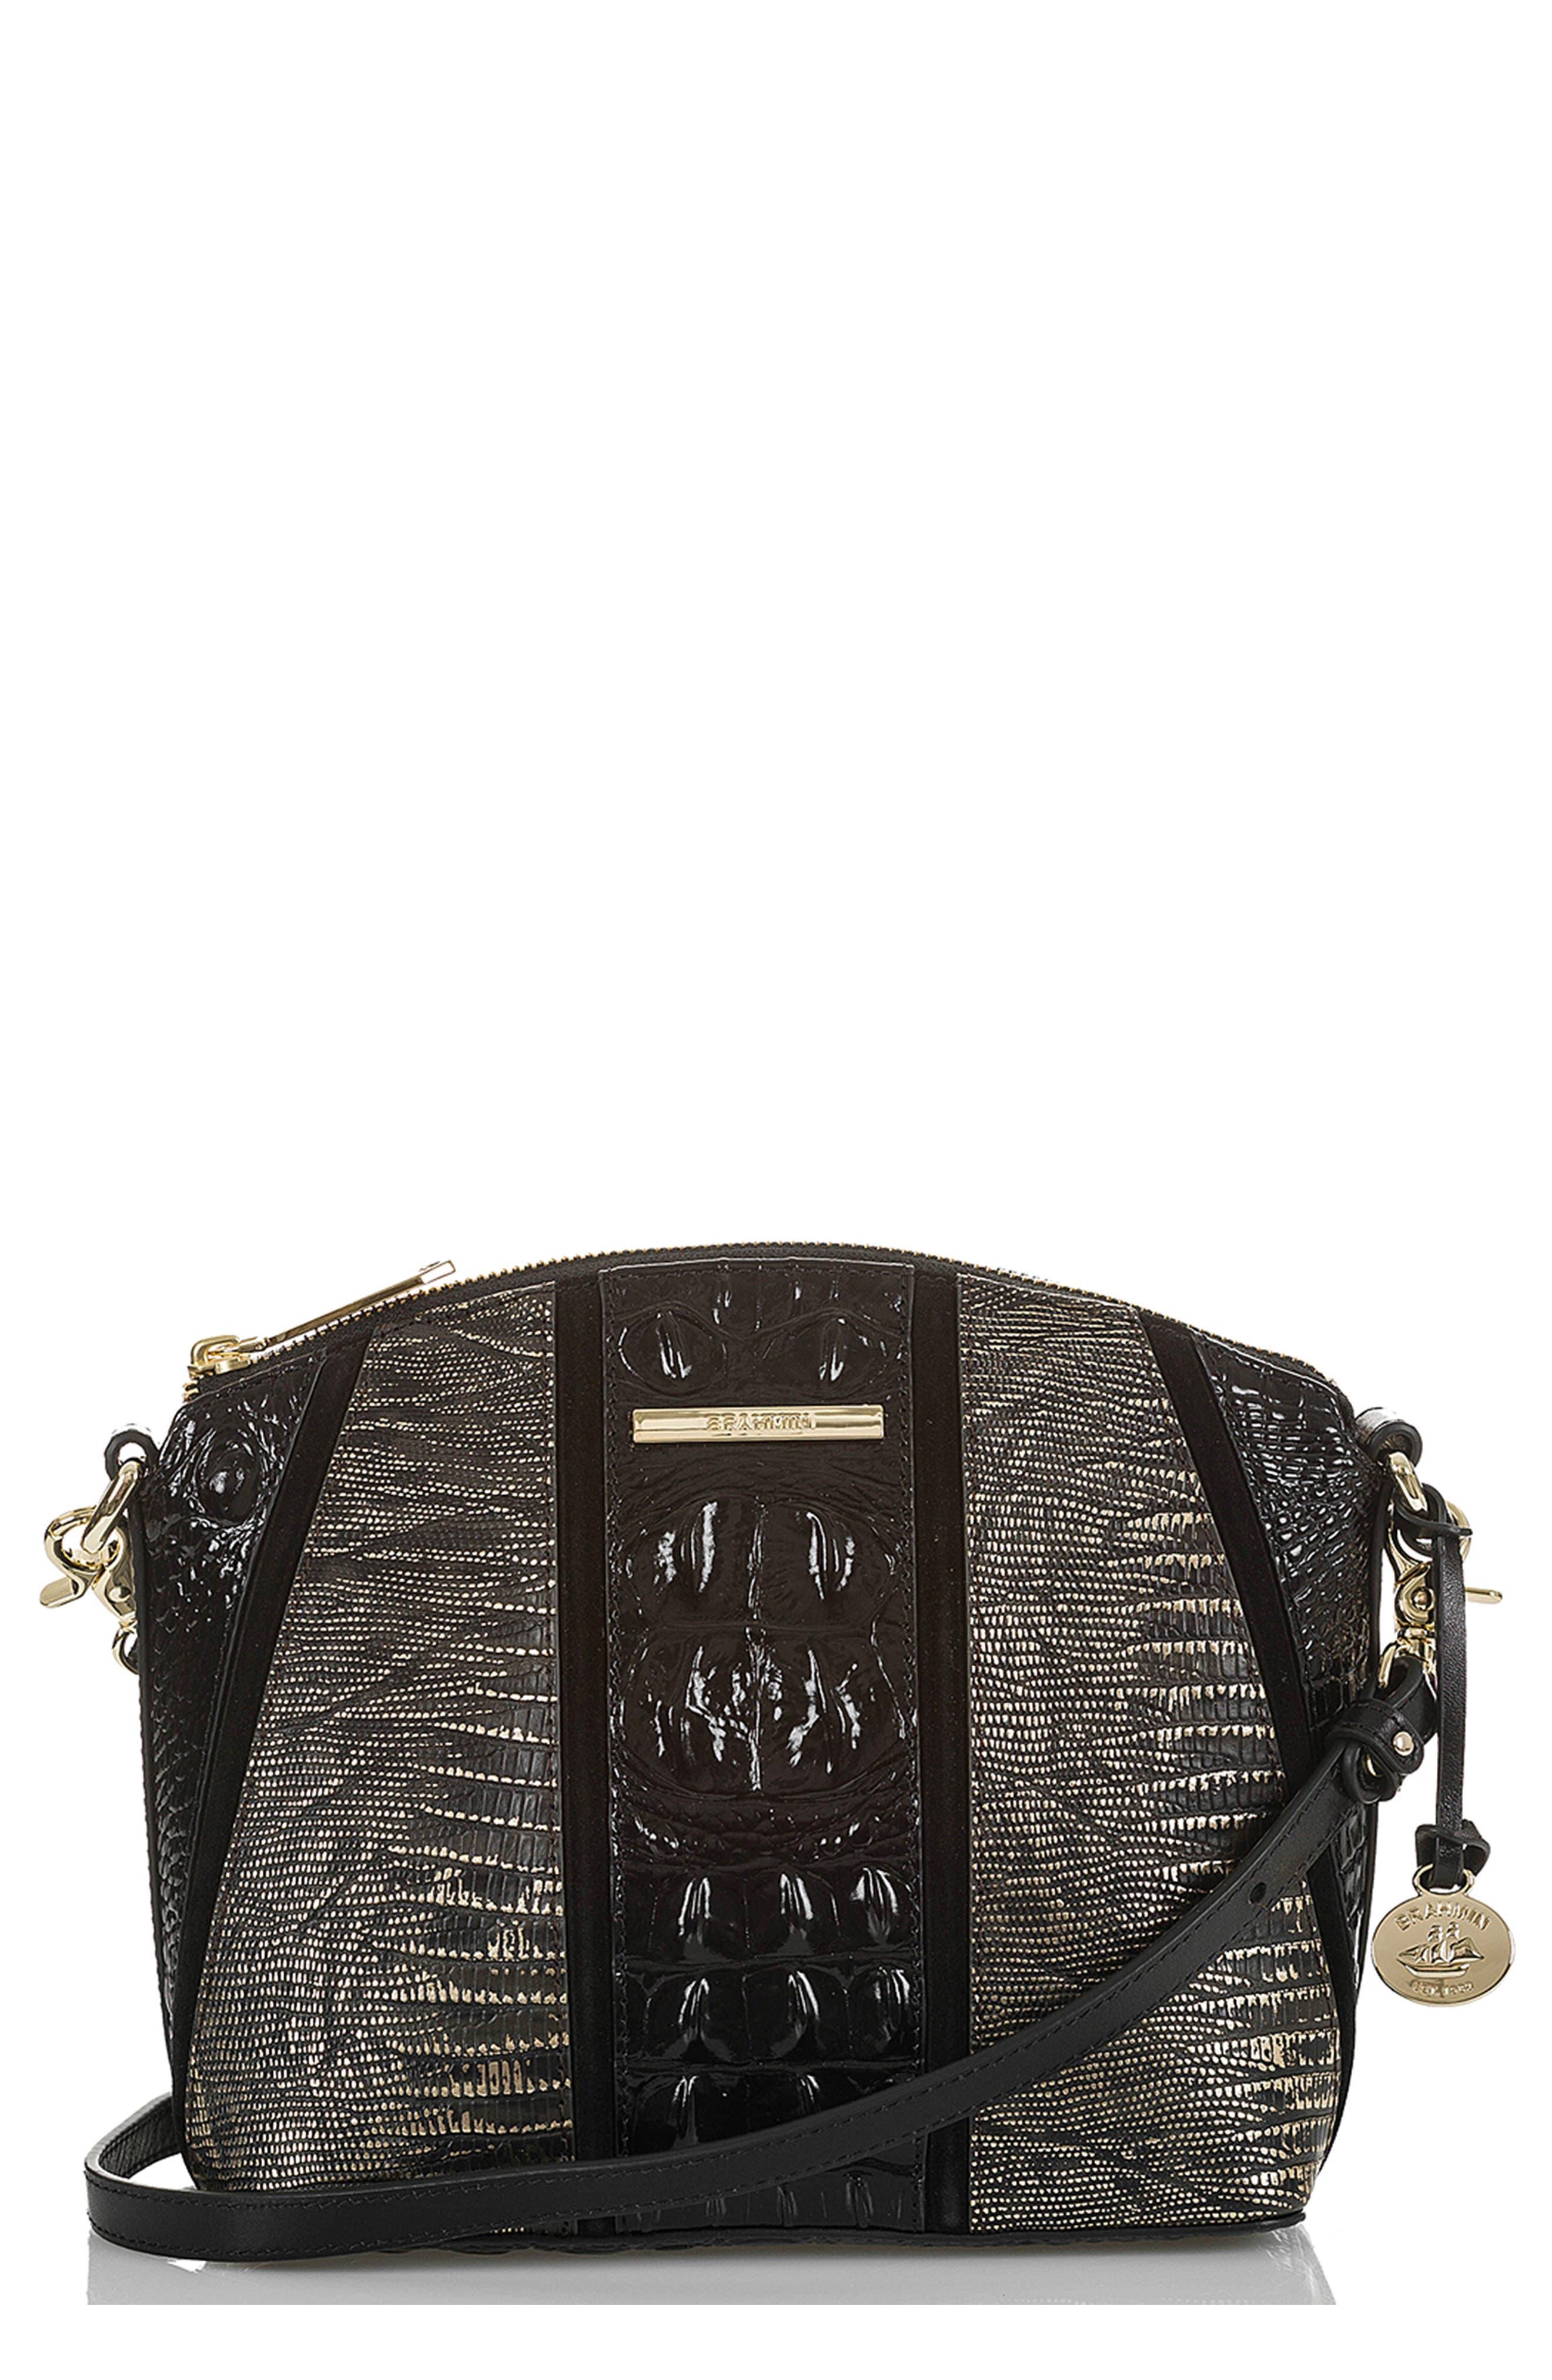 BRAHMIN Mini Duxbury Embossed Leather Crossbody Bag, Main, color, 028